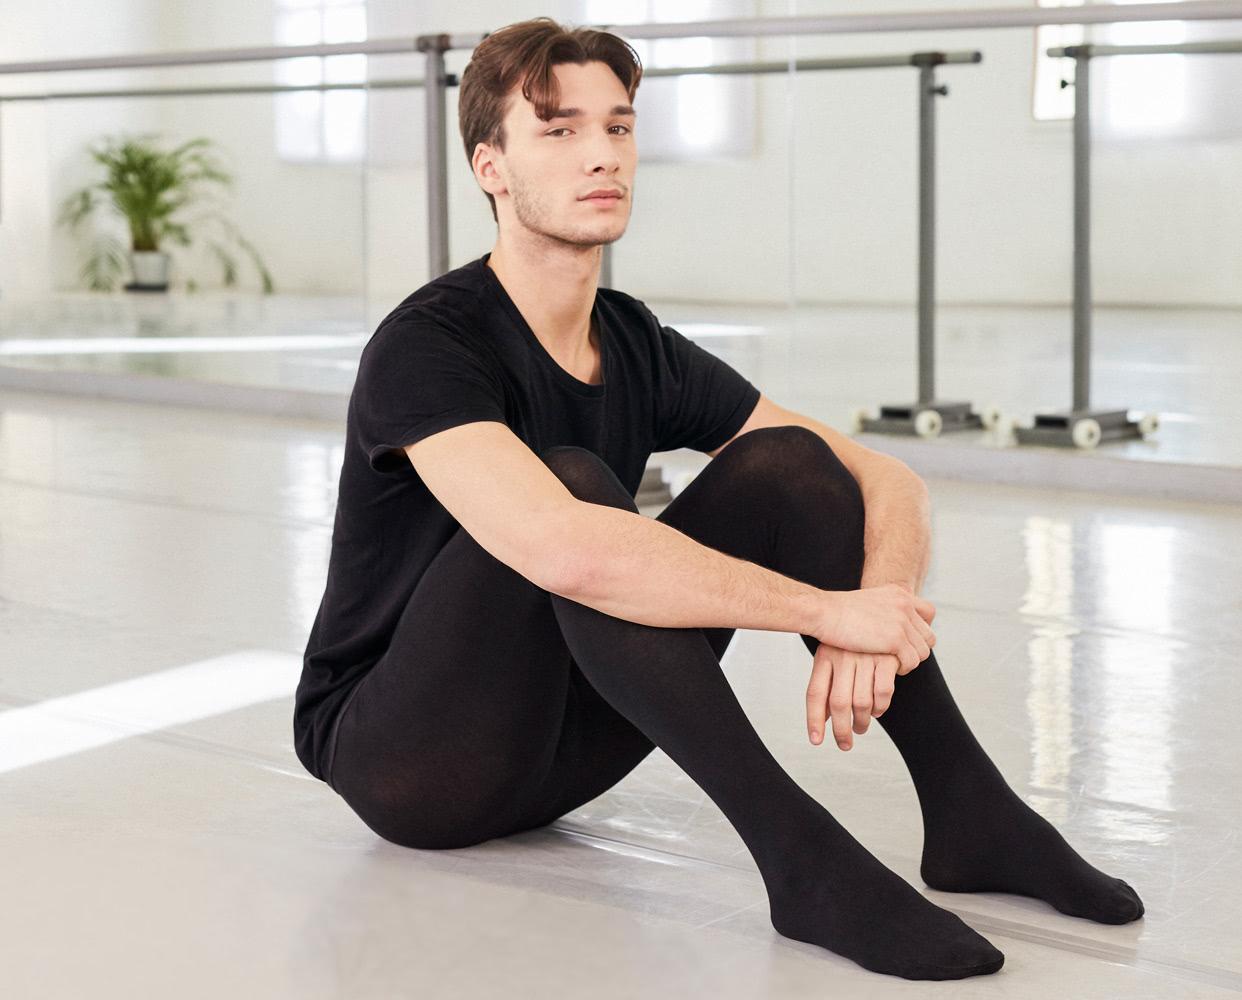 Stockings Sheer Lace Gorgeous Thigh High stockings lingerie Hosiery UK SELLER